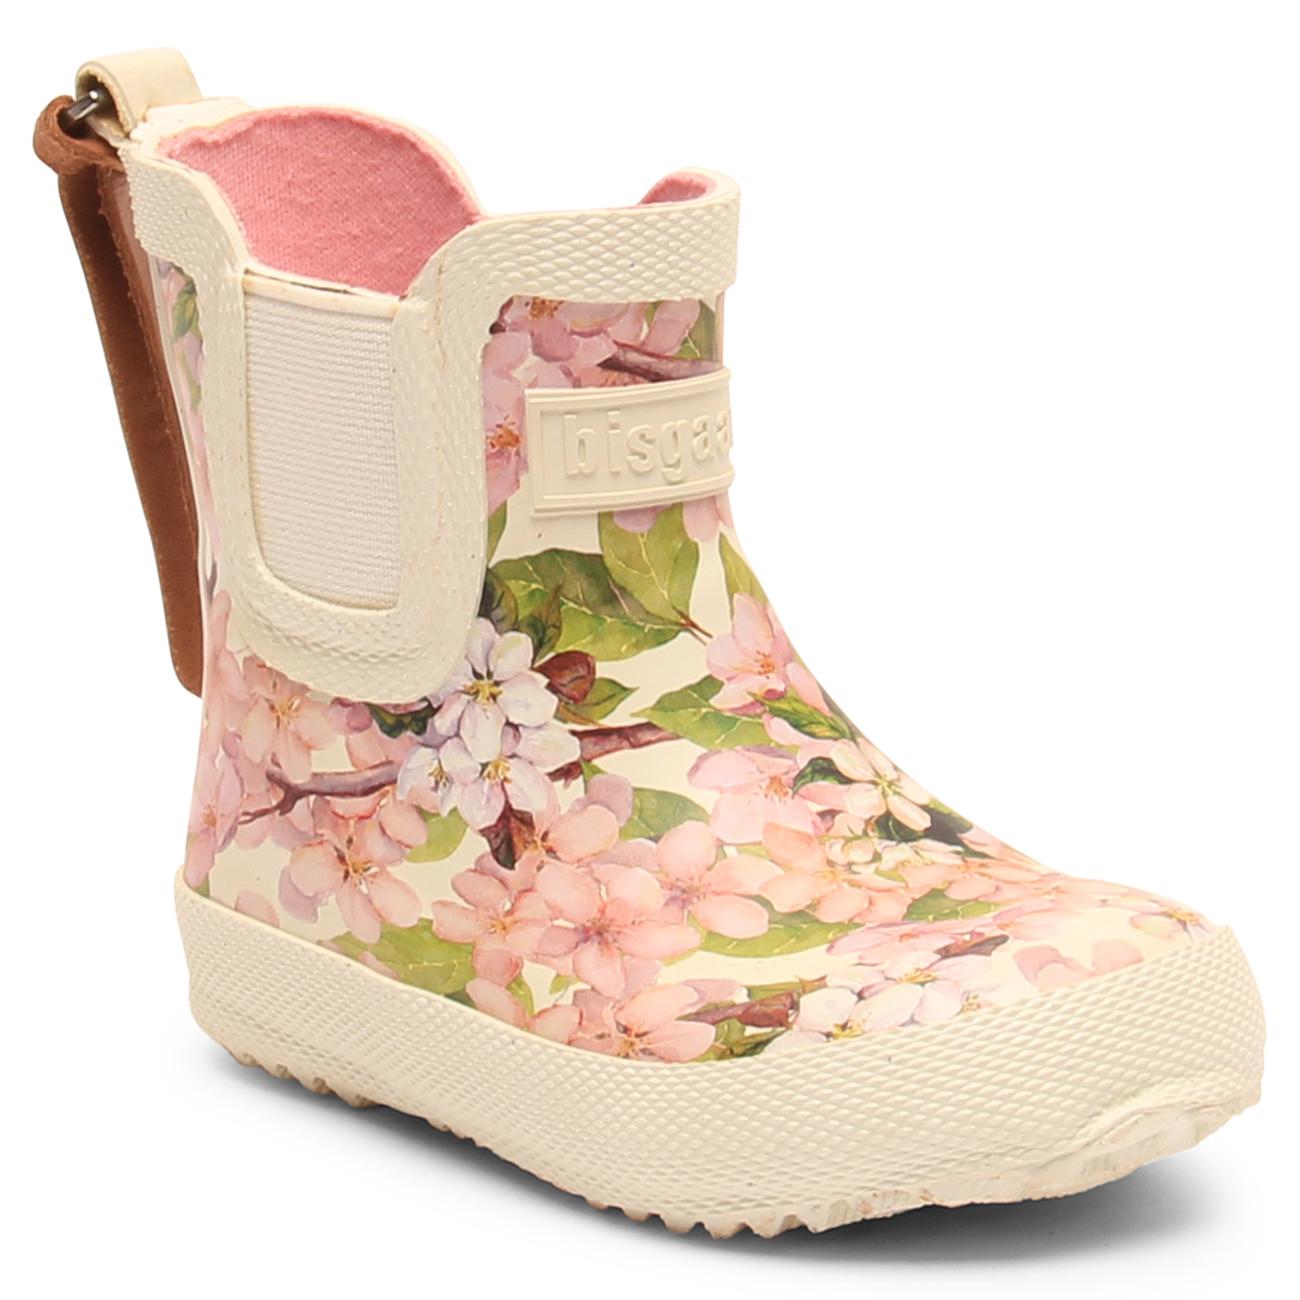 409d763bdd8 Bisgaard Gummistøvler Baby Creme Flowers